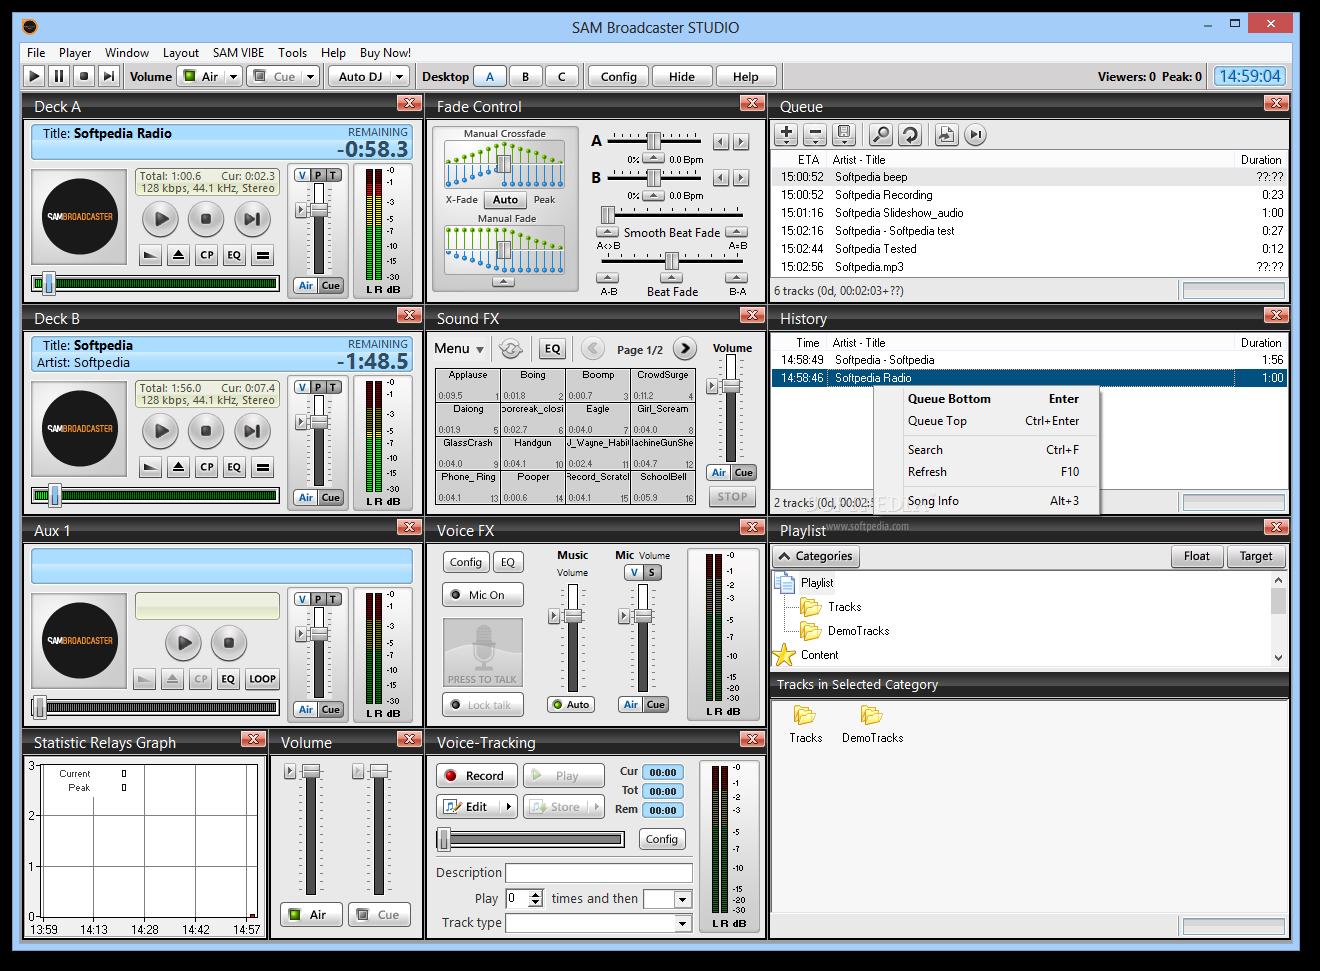 sams broadcaster for windows 10